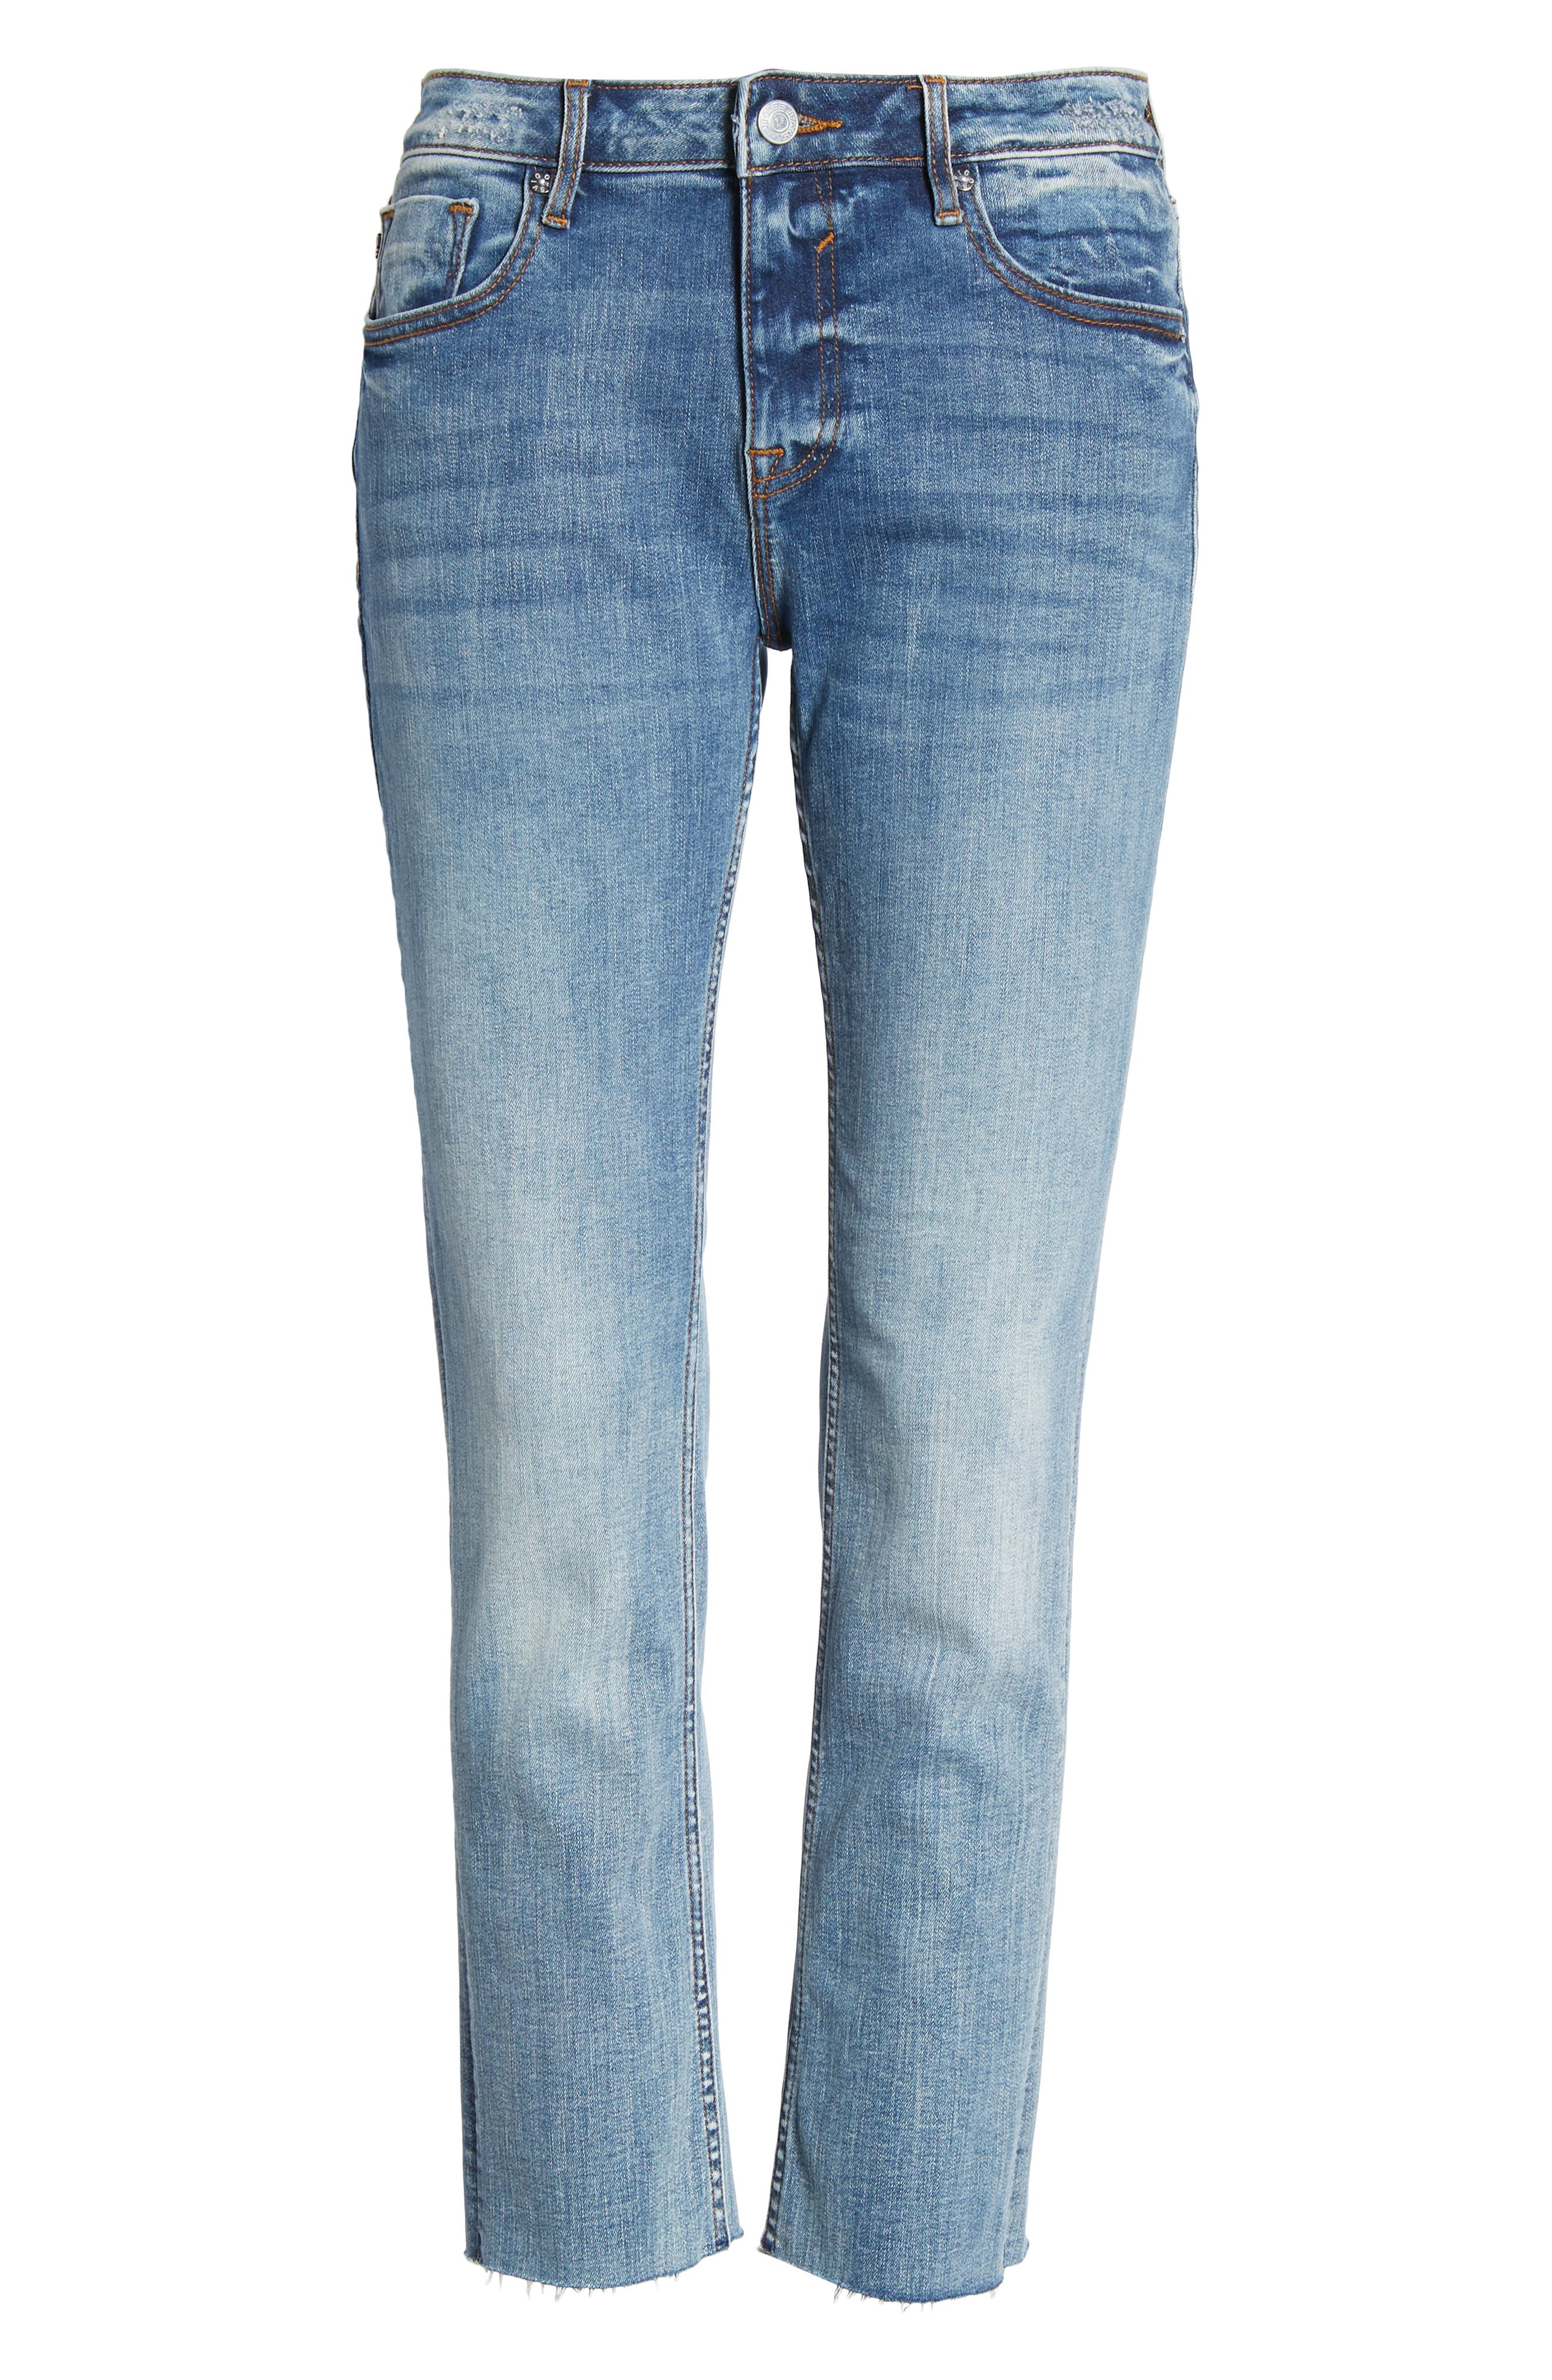 Jagger Crop Straight Leg Jeans,                             Alternate thumbnail 7, color,                             400